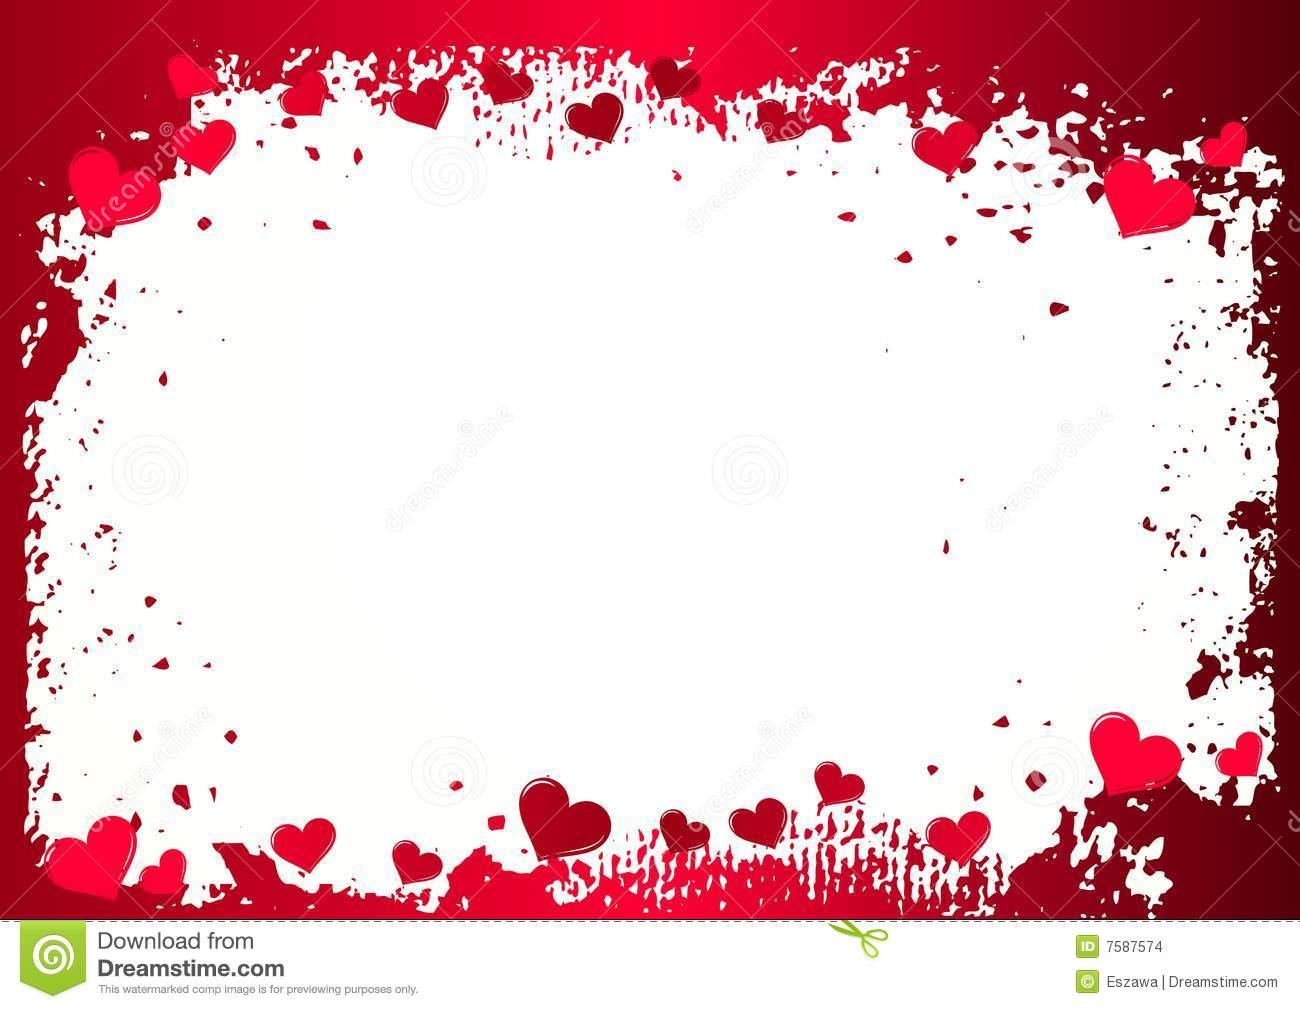 Valentine Backgrounds and Wallpaper - WallpaperSafari